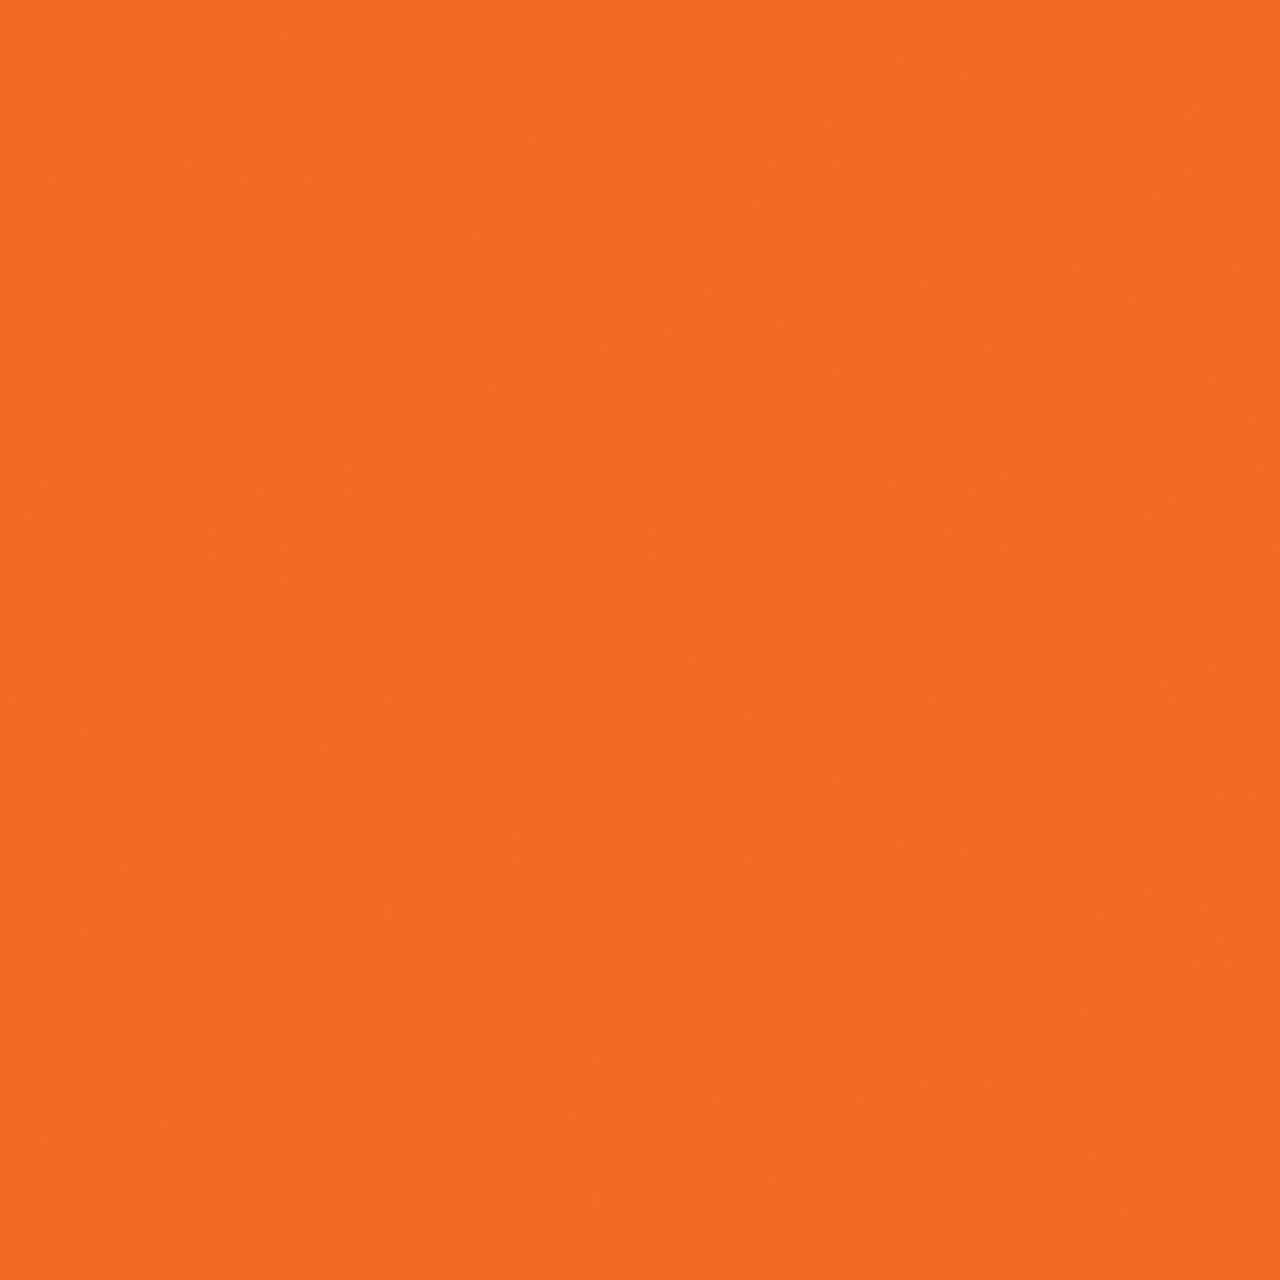 LEE FILTERS 105 SHEET ORANGE SHEET Gel-Sheets